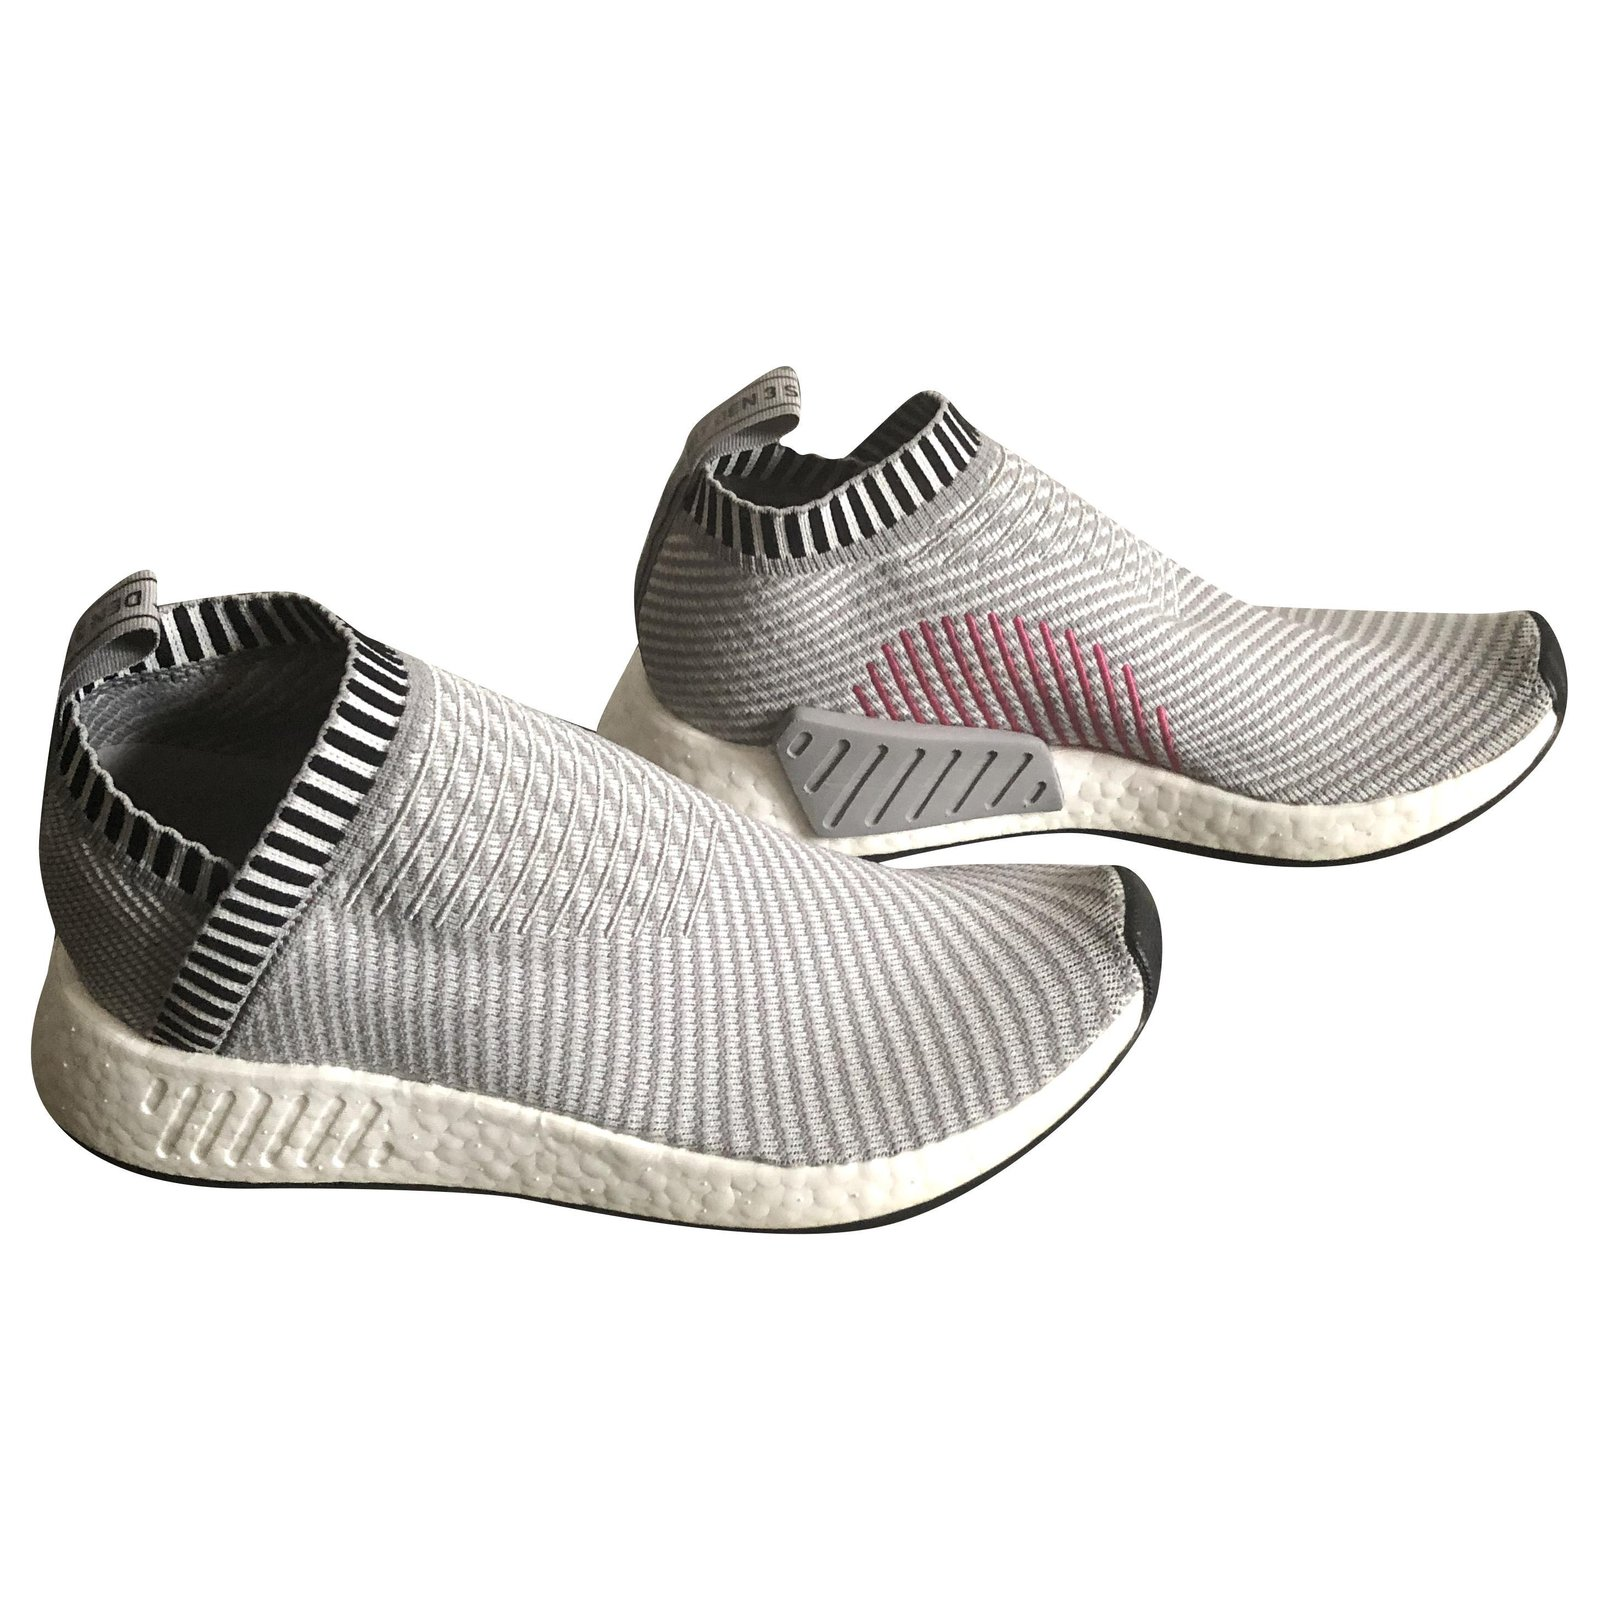 Baskets homme Adidas Adidas NMD sans lacets grises pointure 42 2/3 ...